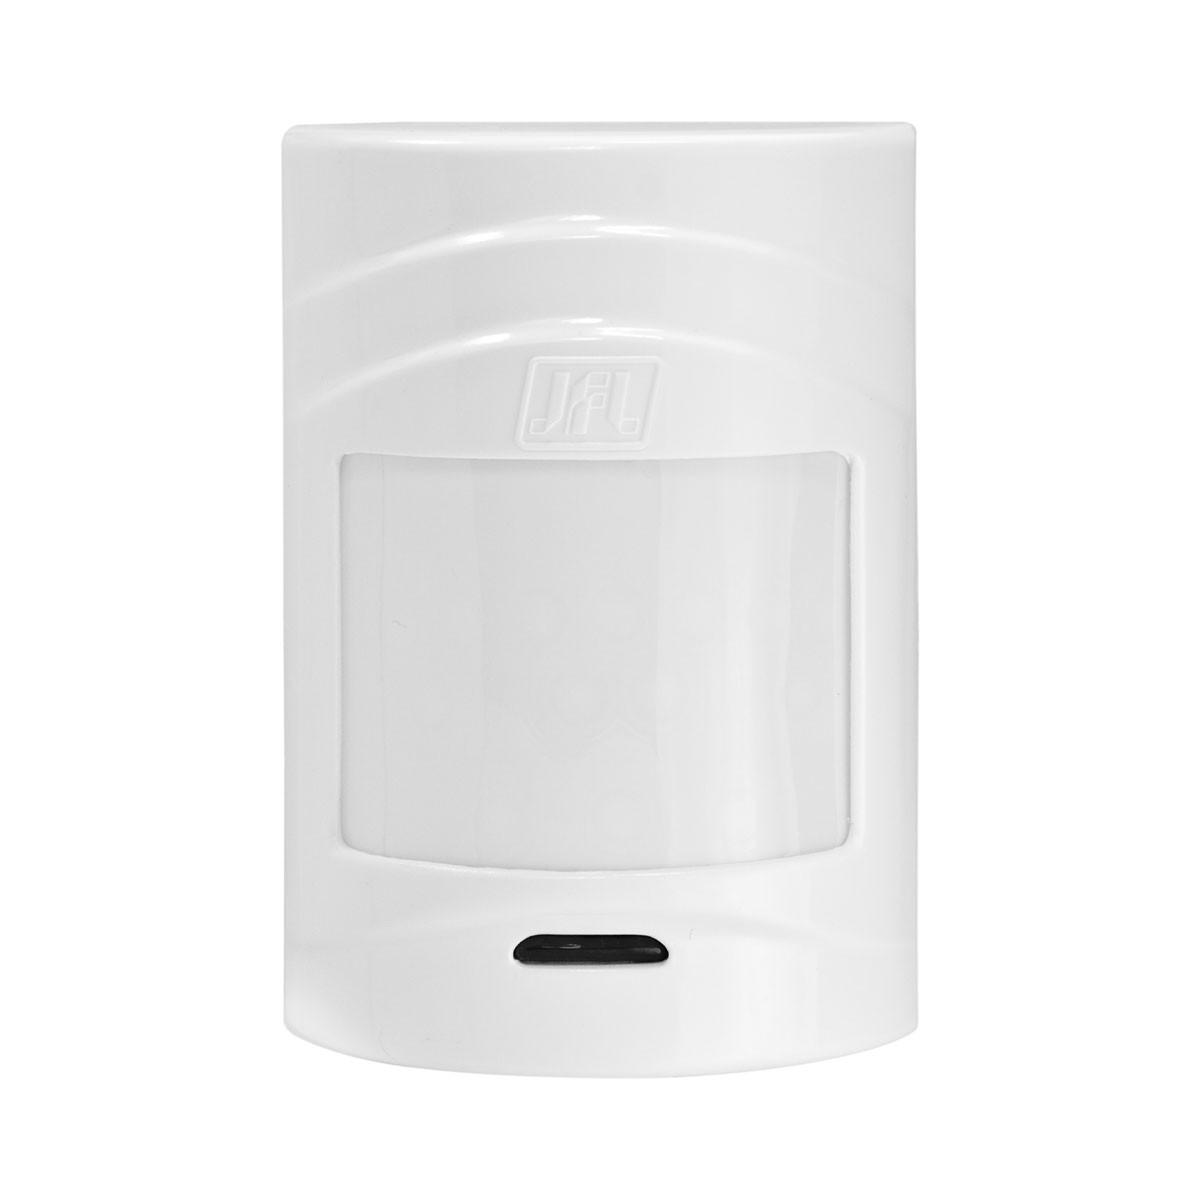 Kit Alarme Monitorado App SmartCloud 18 Jfl Sensores Sem Fio